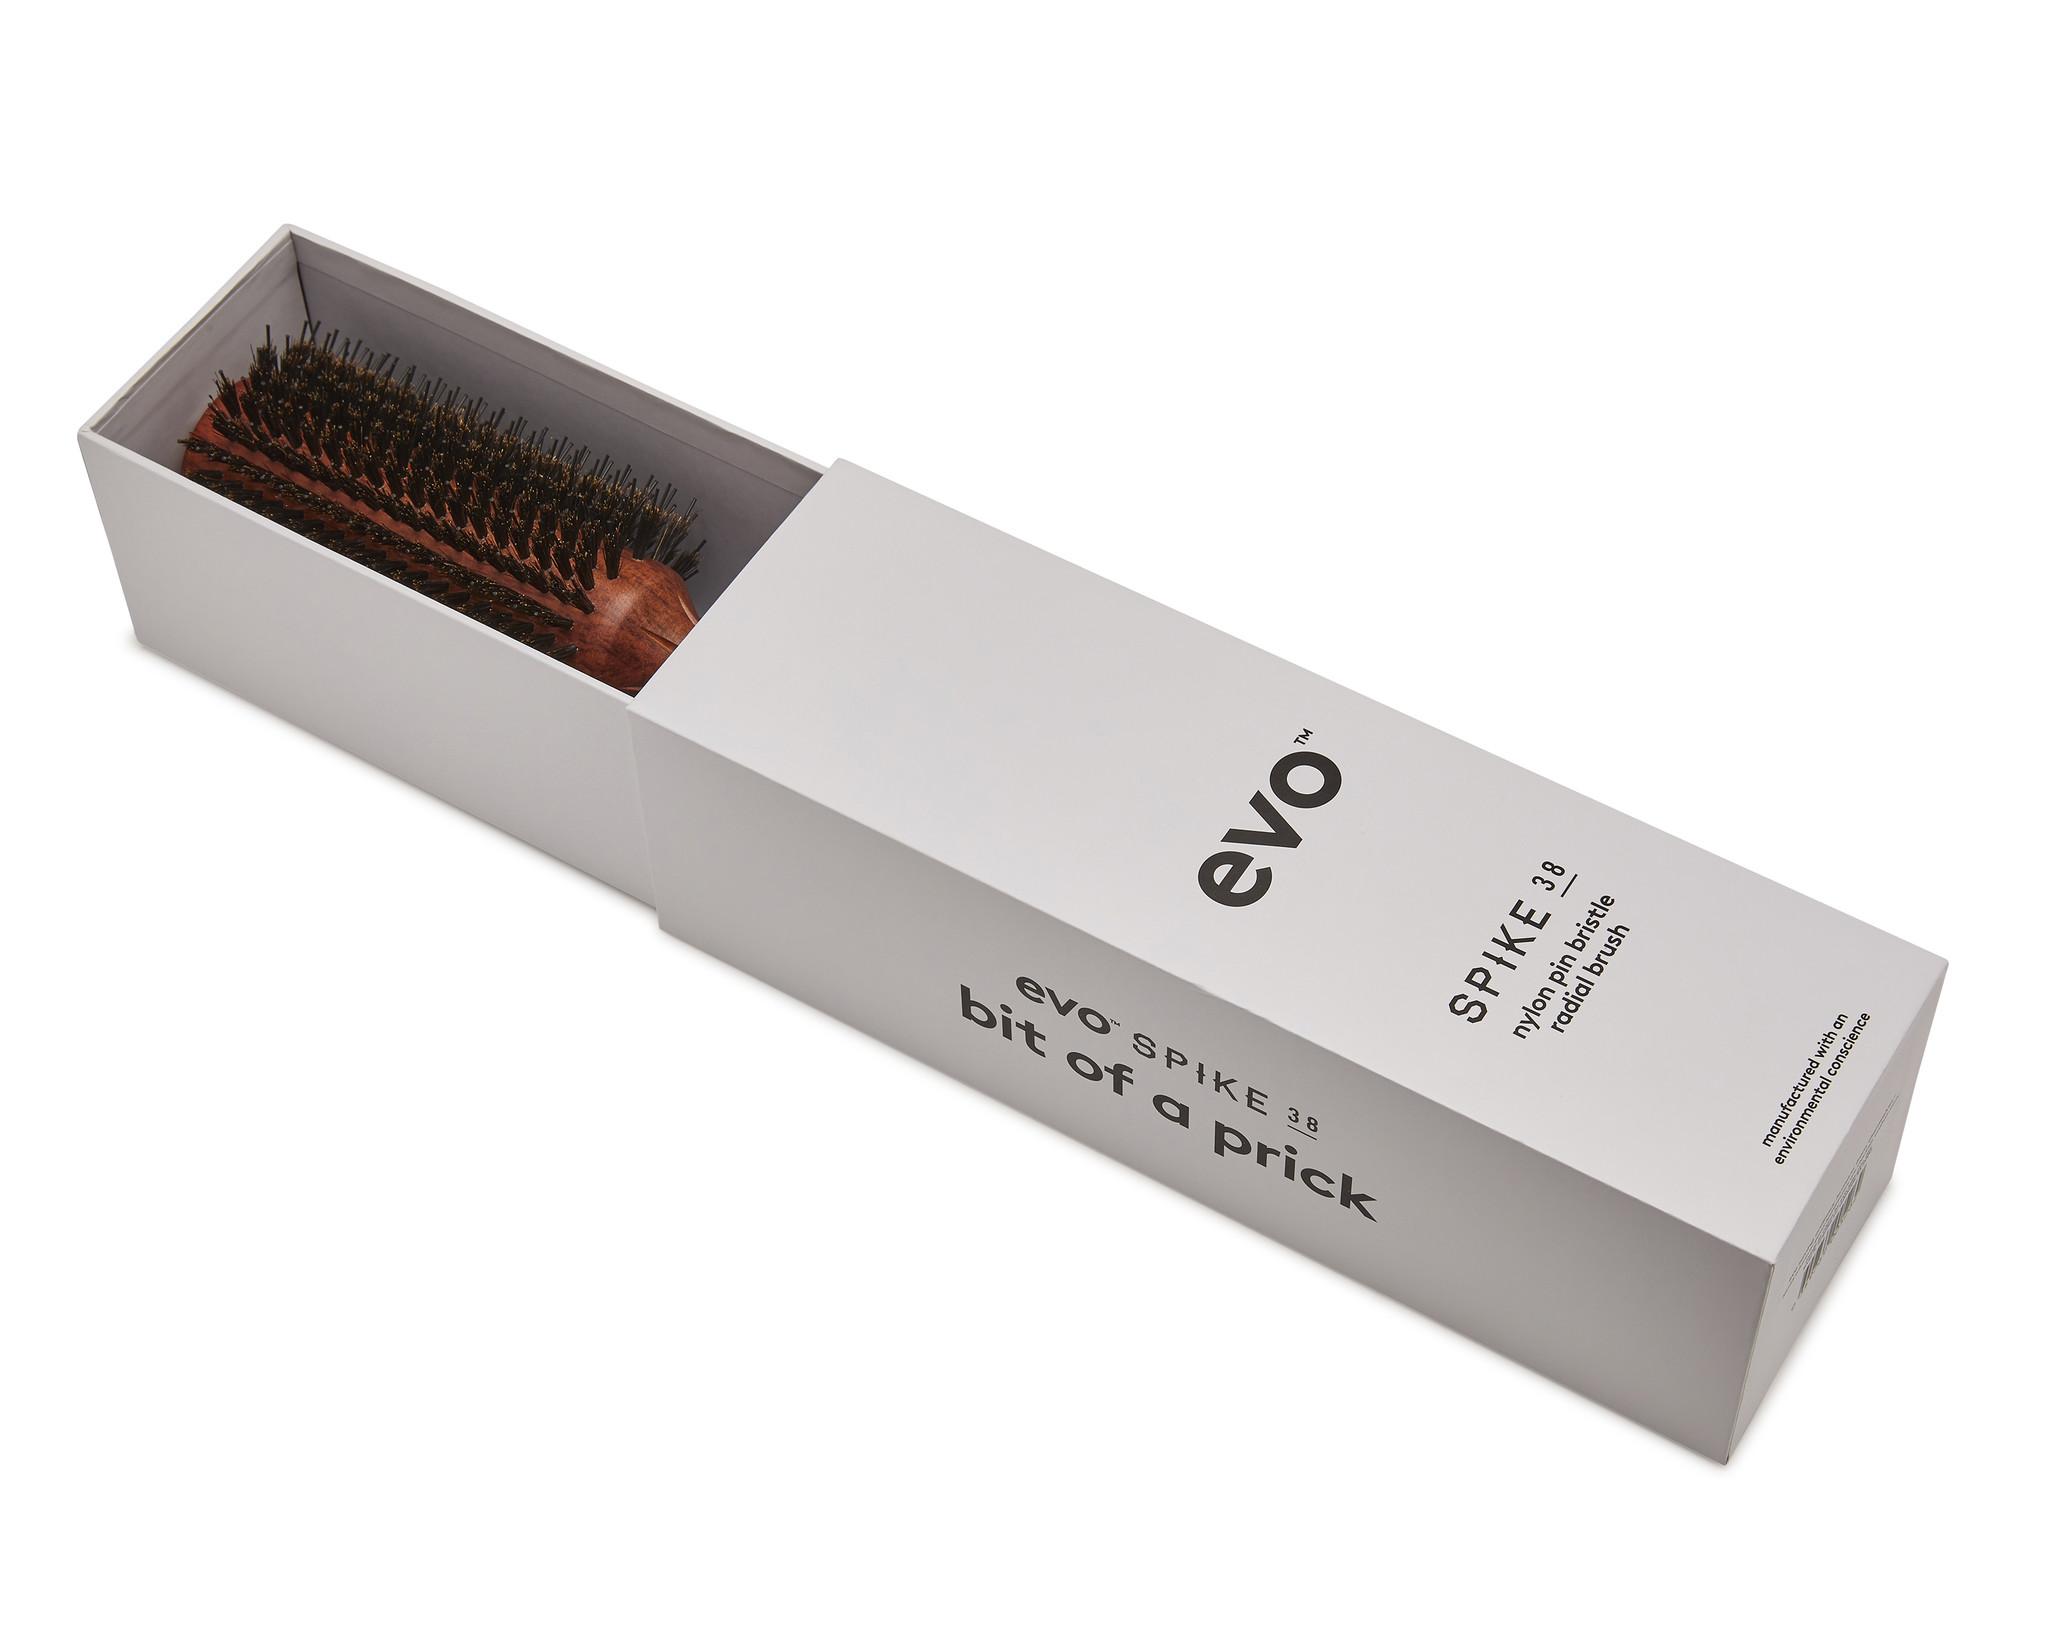 EVO Brosse SPIKE ronde à poils et picots 38mm